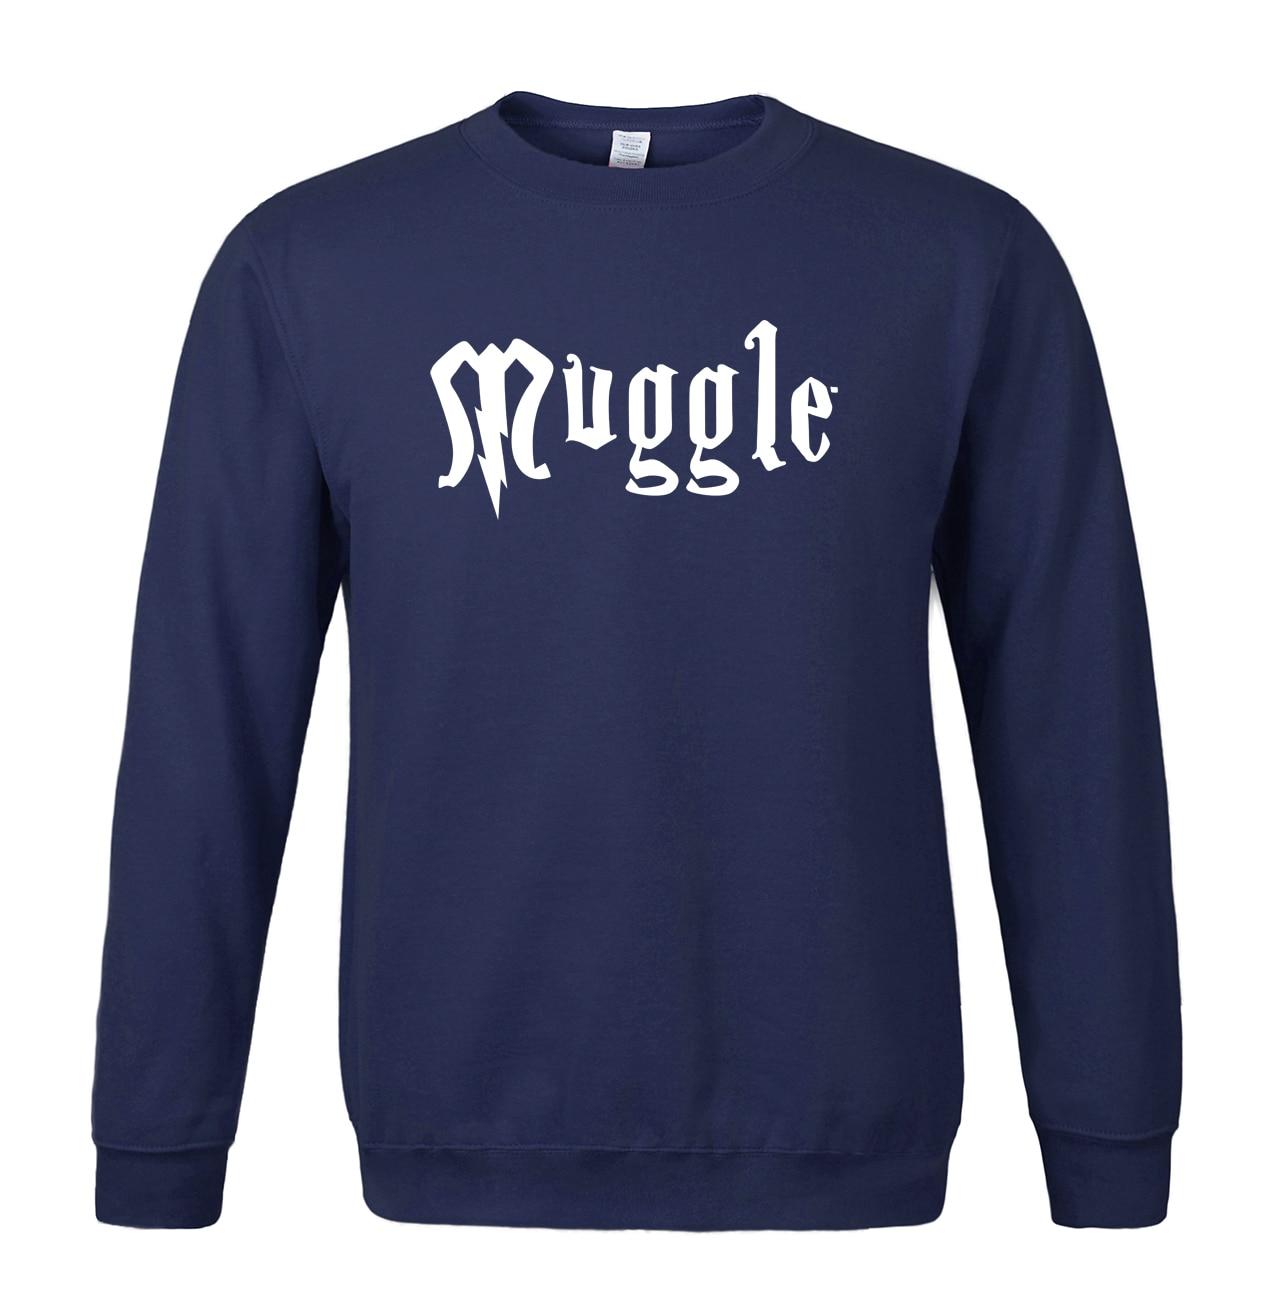 Hot Sale men sweatshirt funny letters print 2019 spring winter fleece men hoodies hip hop loose fit streetwear movie fans